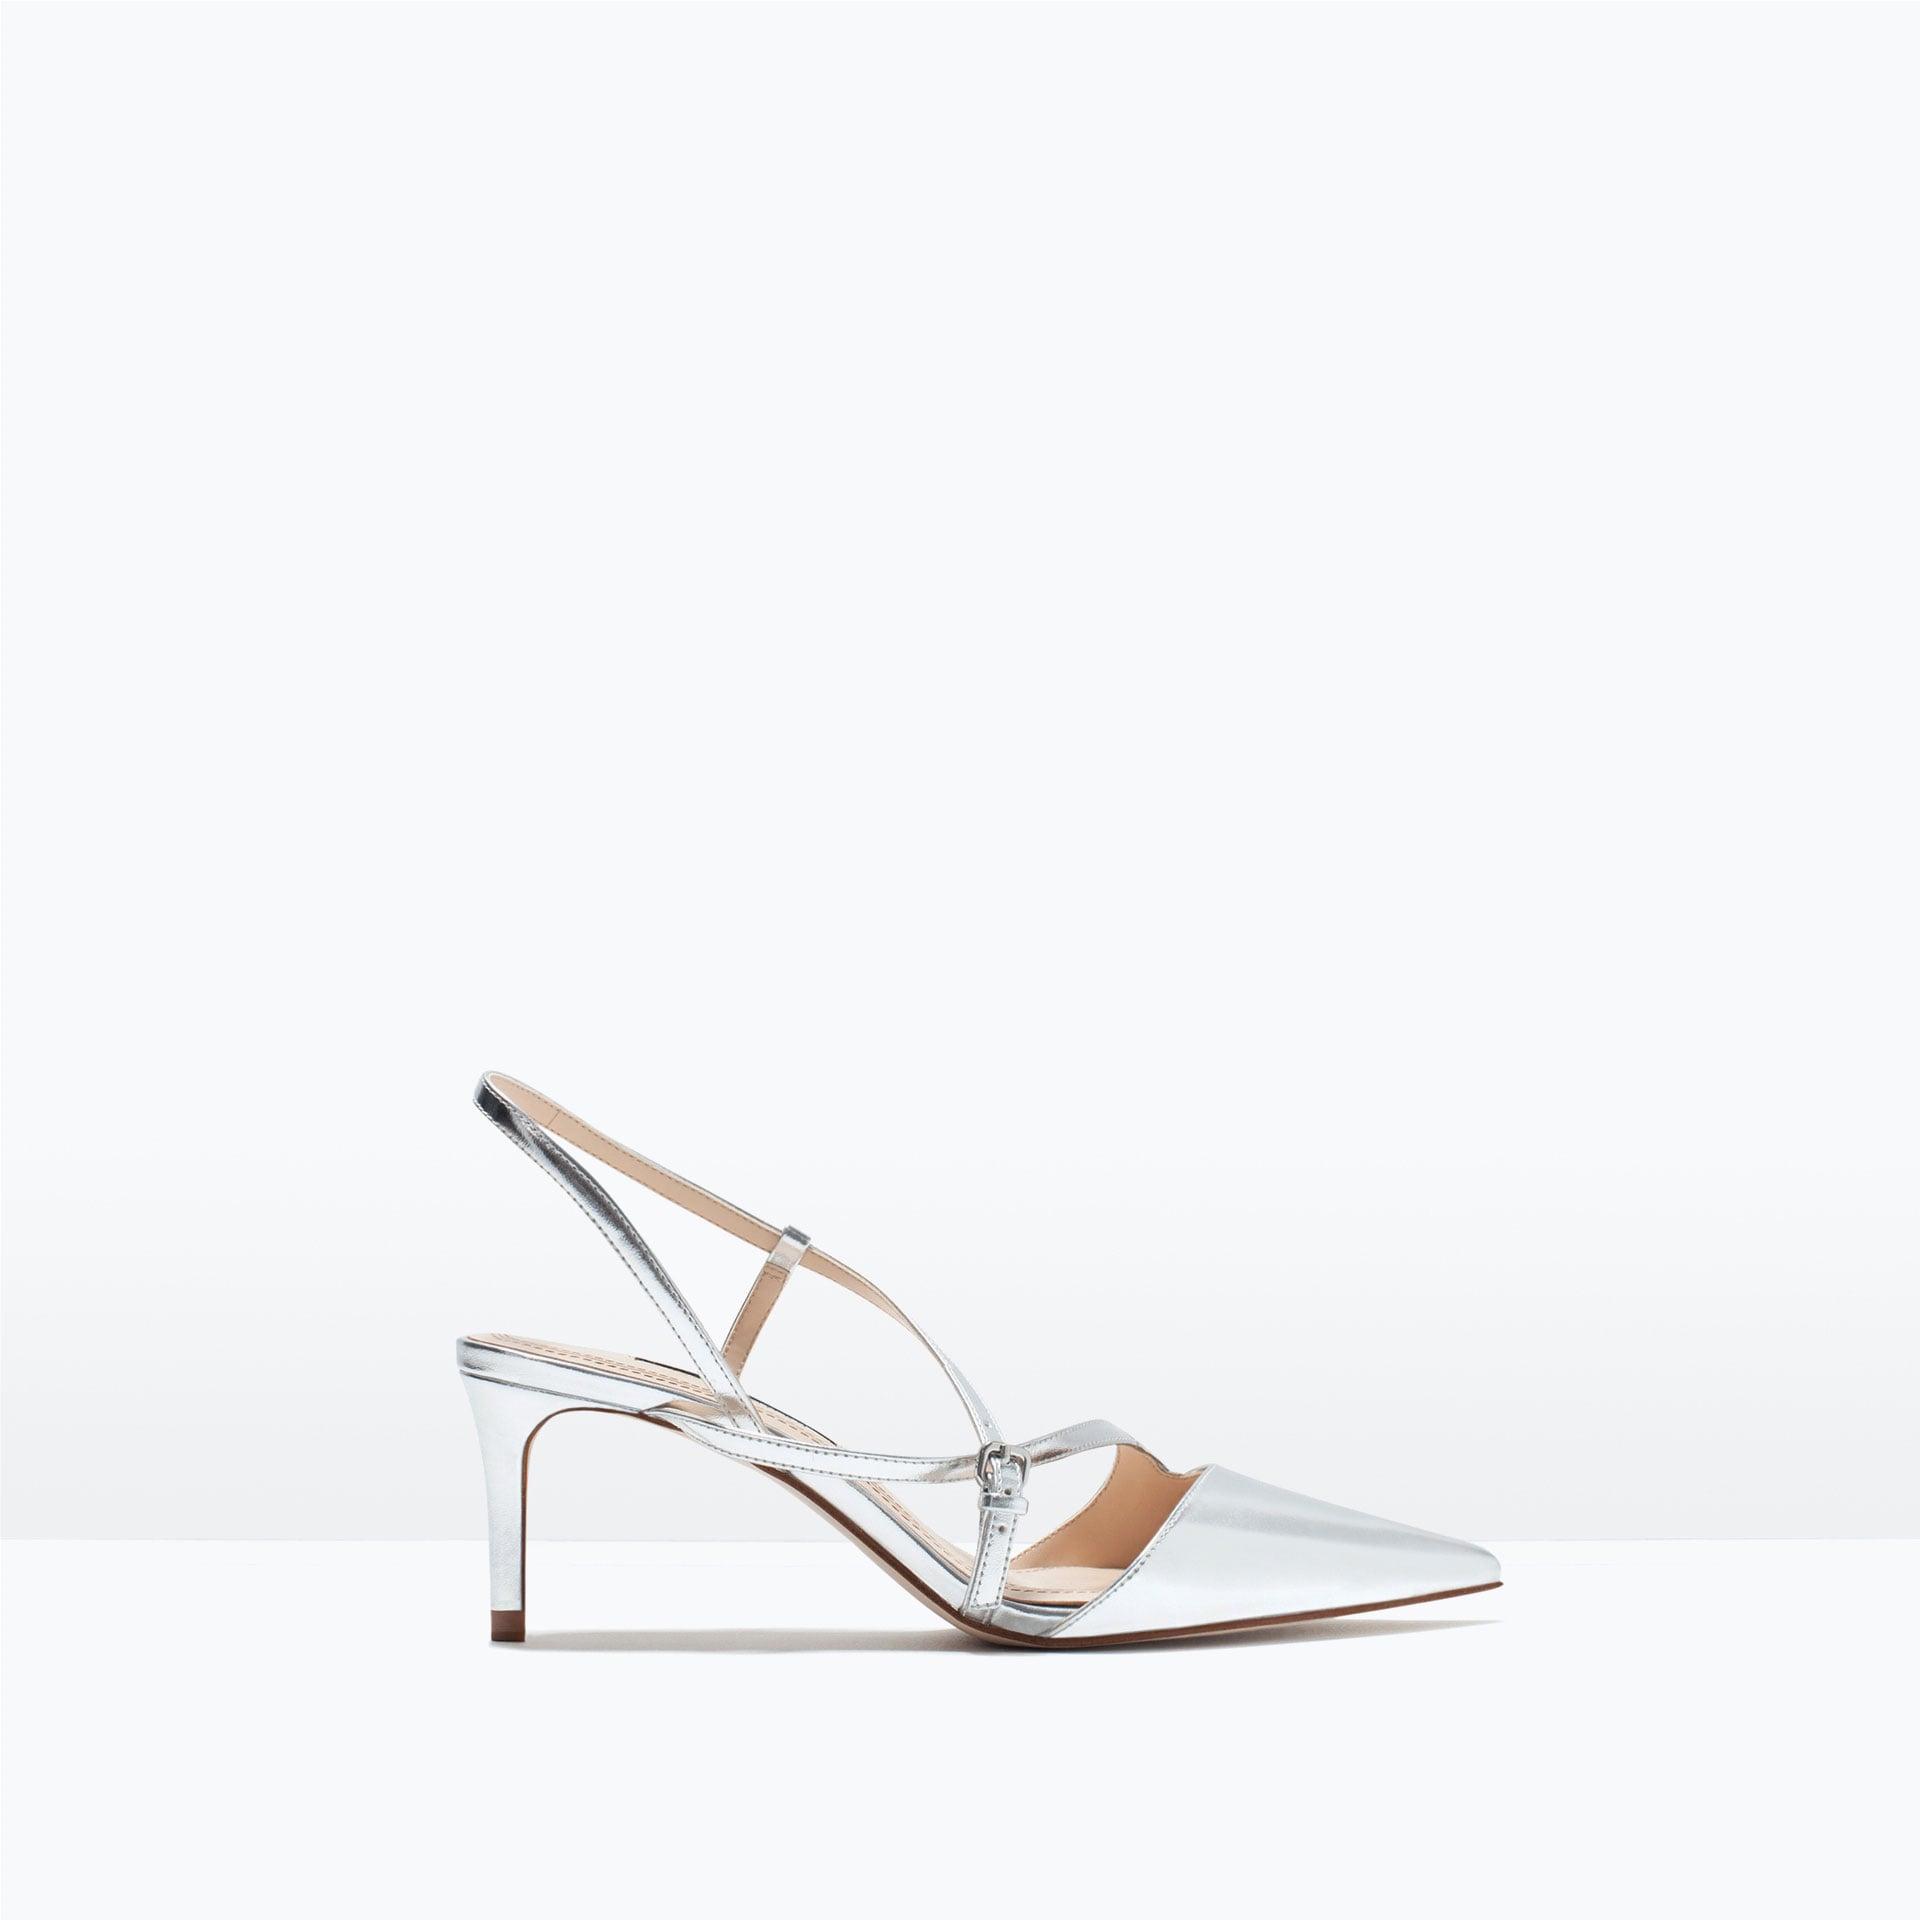 Zara Mid-Heel Strappy Shoe